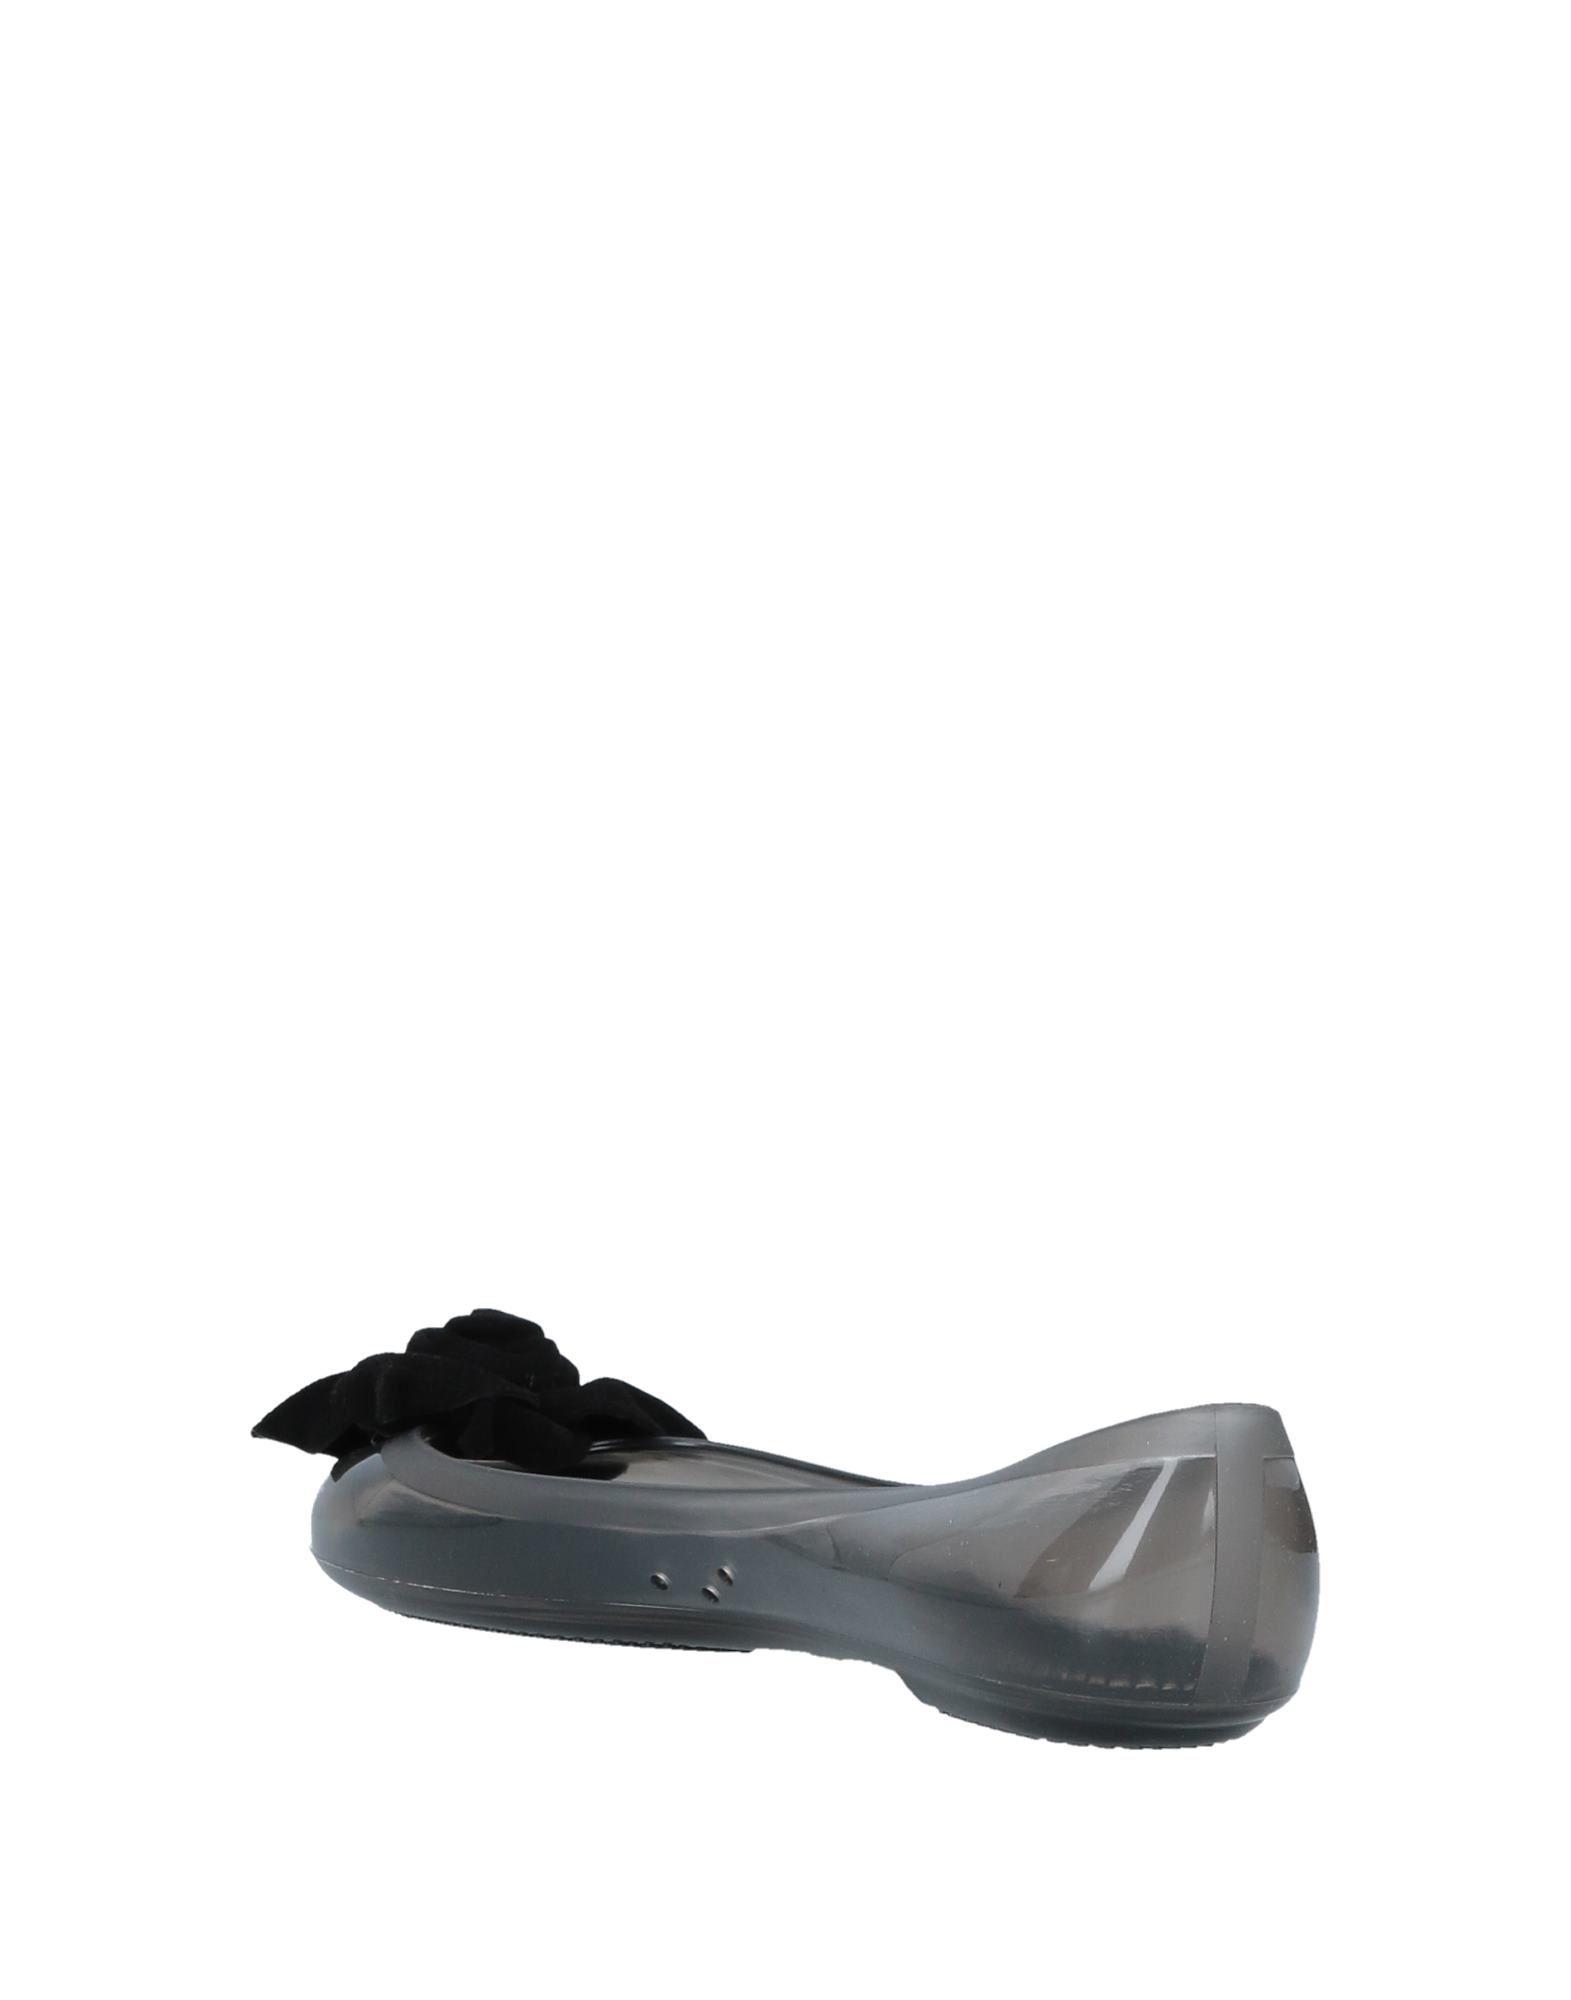 Enrico Fantini Ballet Ballet Ballet Flats - Women Enrico Fantini Ballet Flats online on  United Kingdom - 11522321JJ 10a248